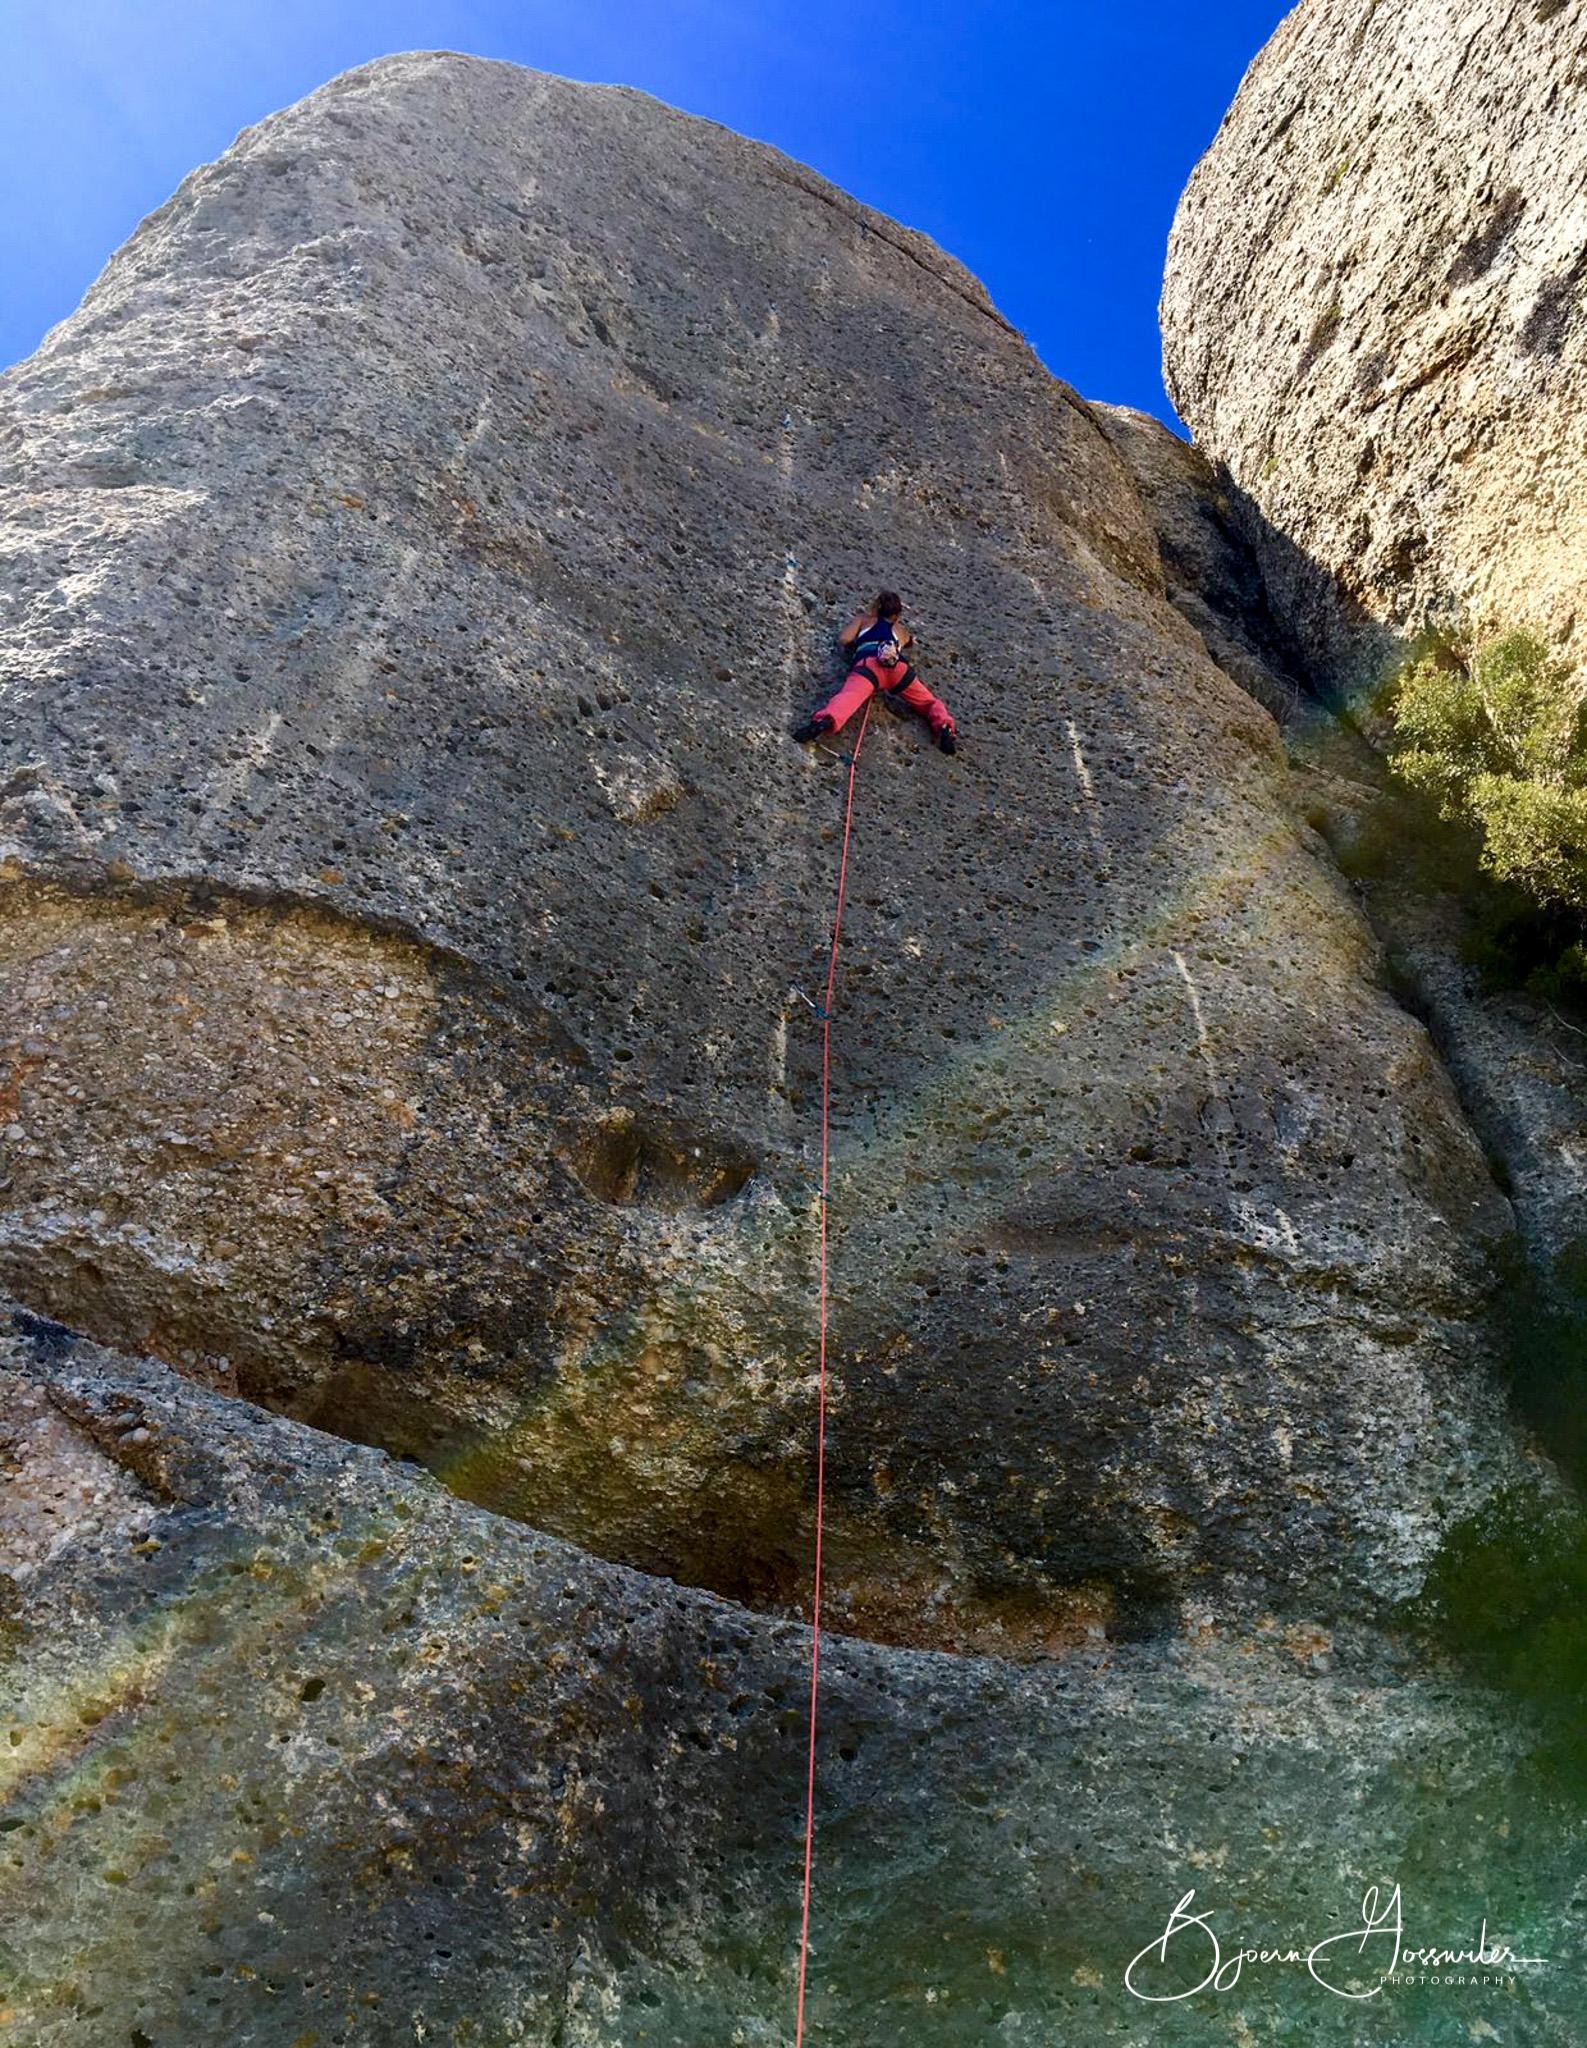 Desiree climbing montsant